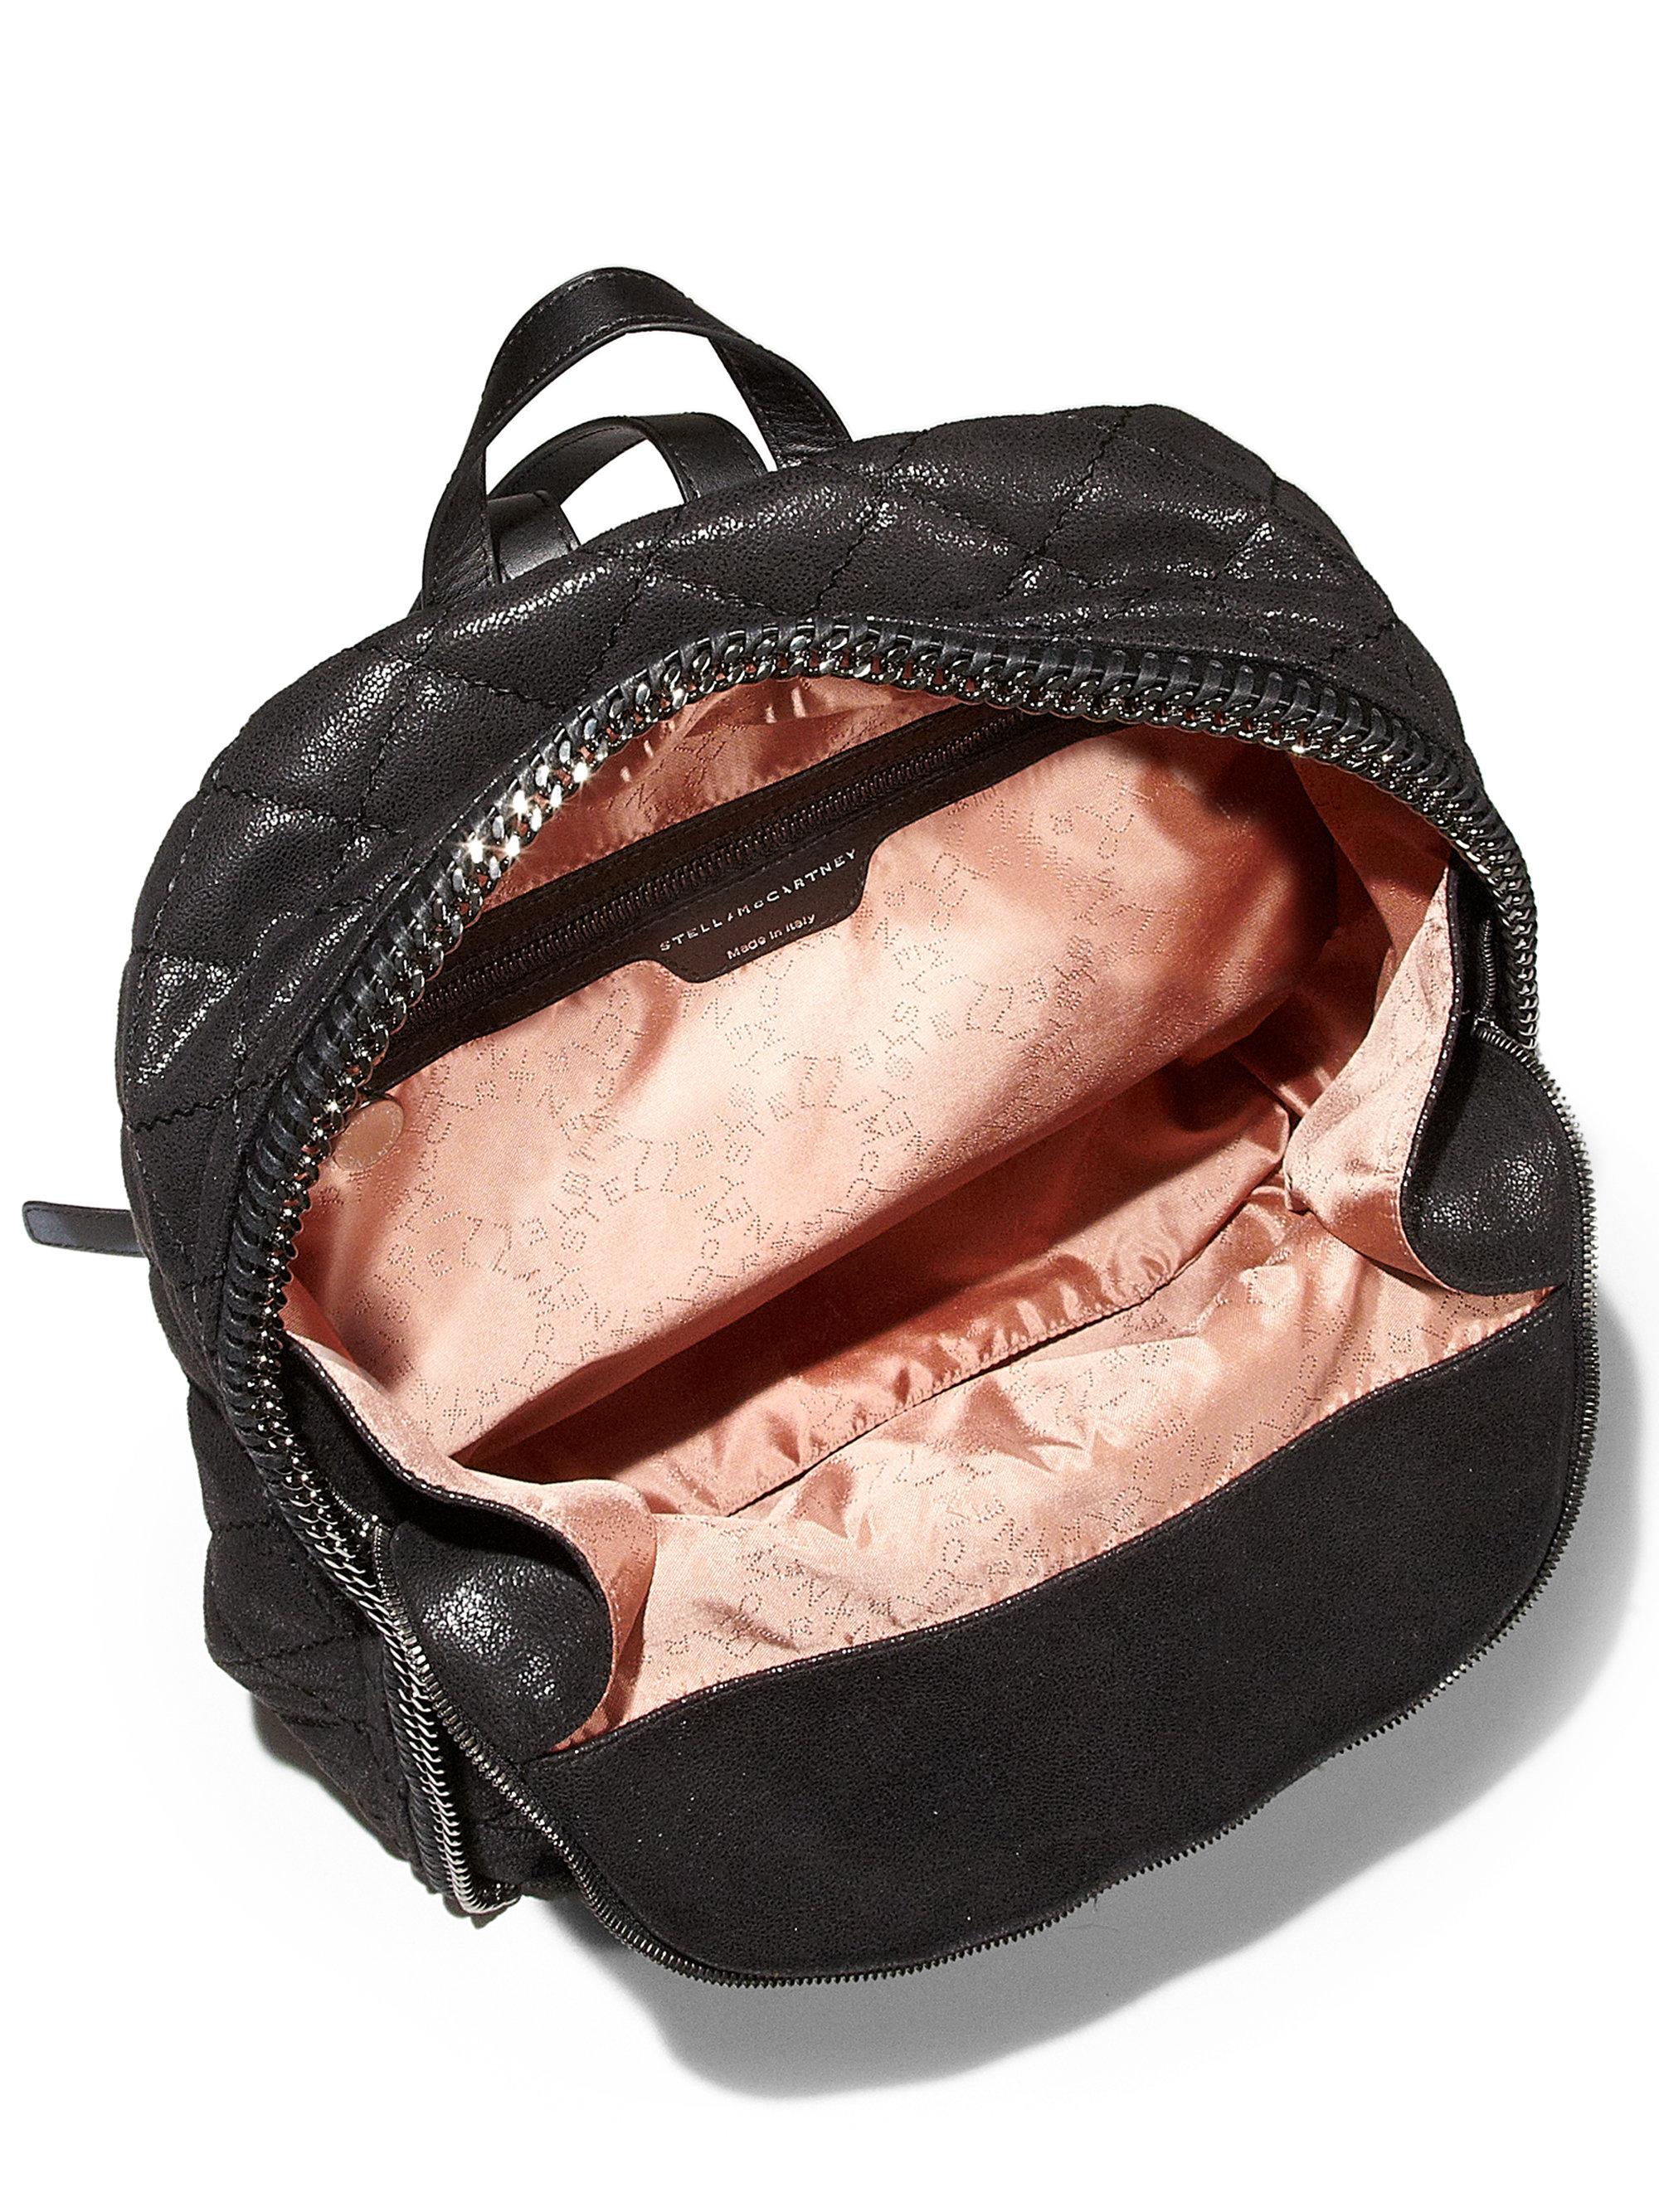 stella mccartney quilted backpack in black lyst. Black Bedroom Furniture Sets. Home Design Ideas